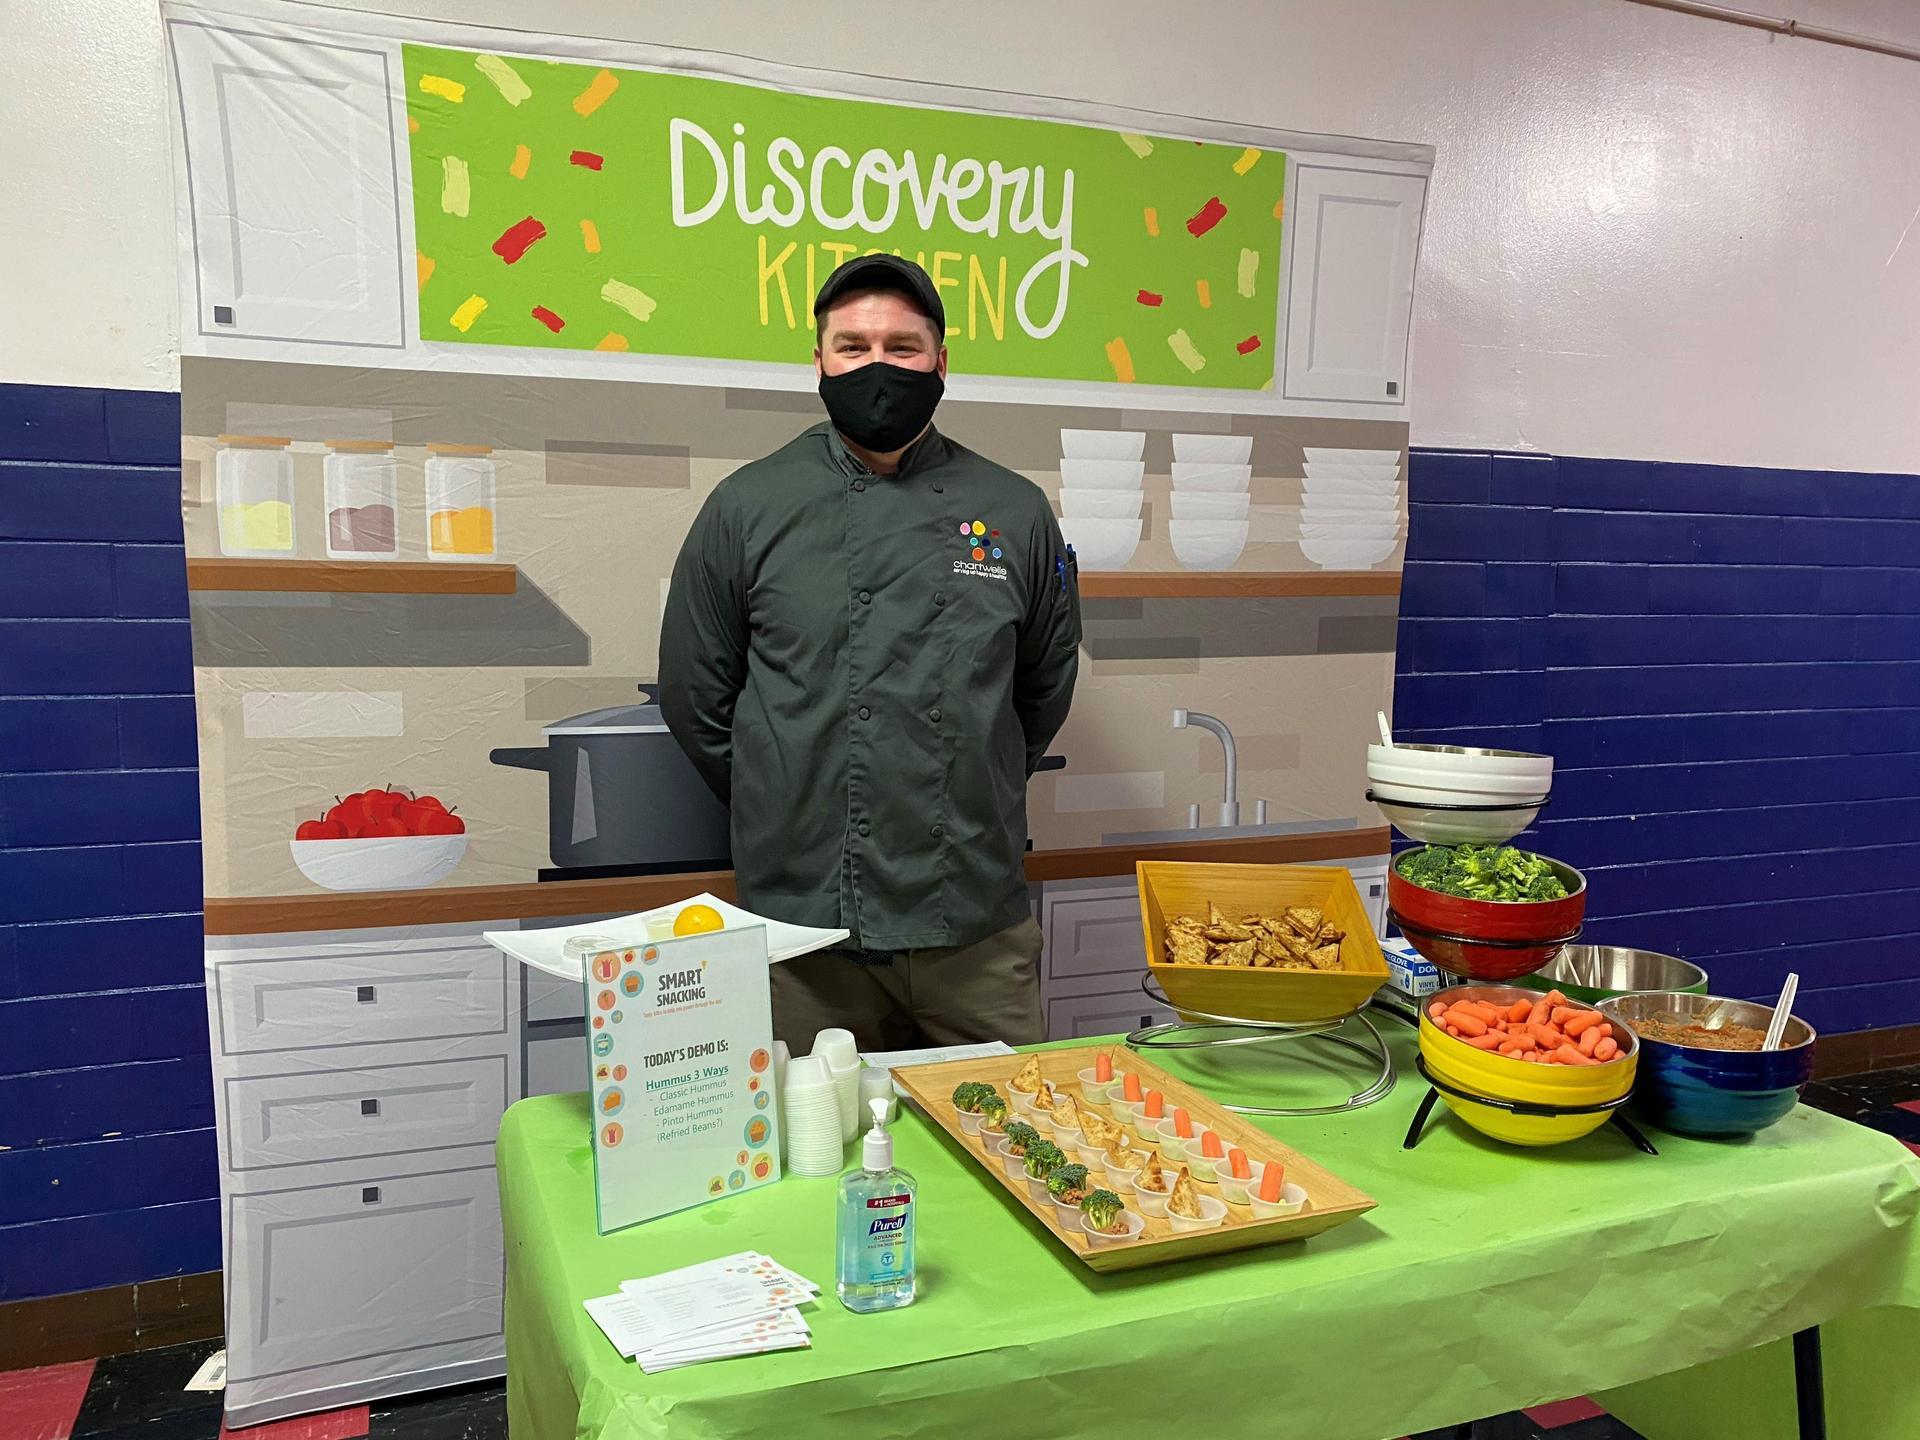 Discovery Kitchen at Aspire - Hummus 3 Ways